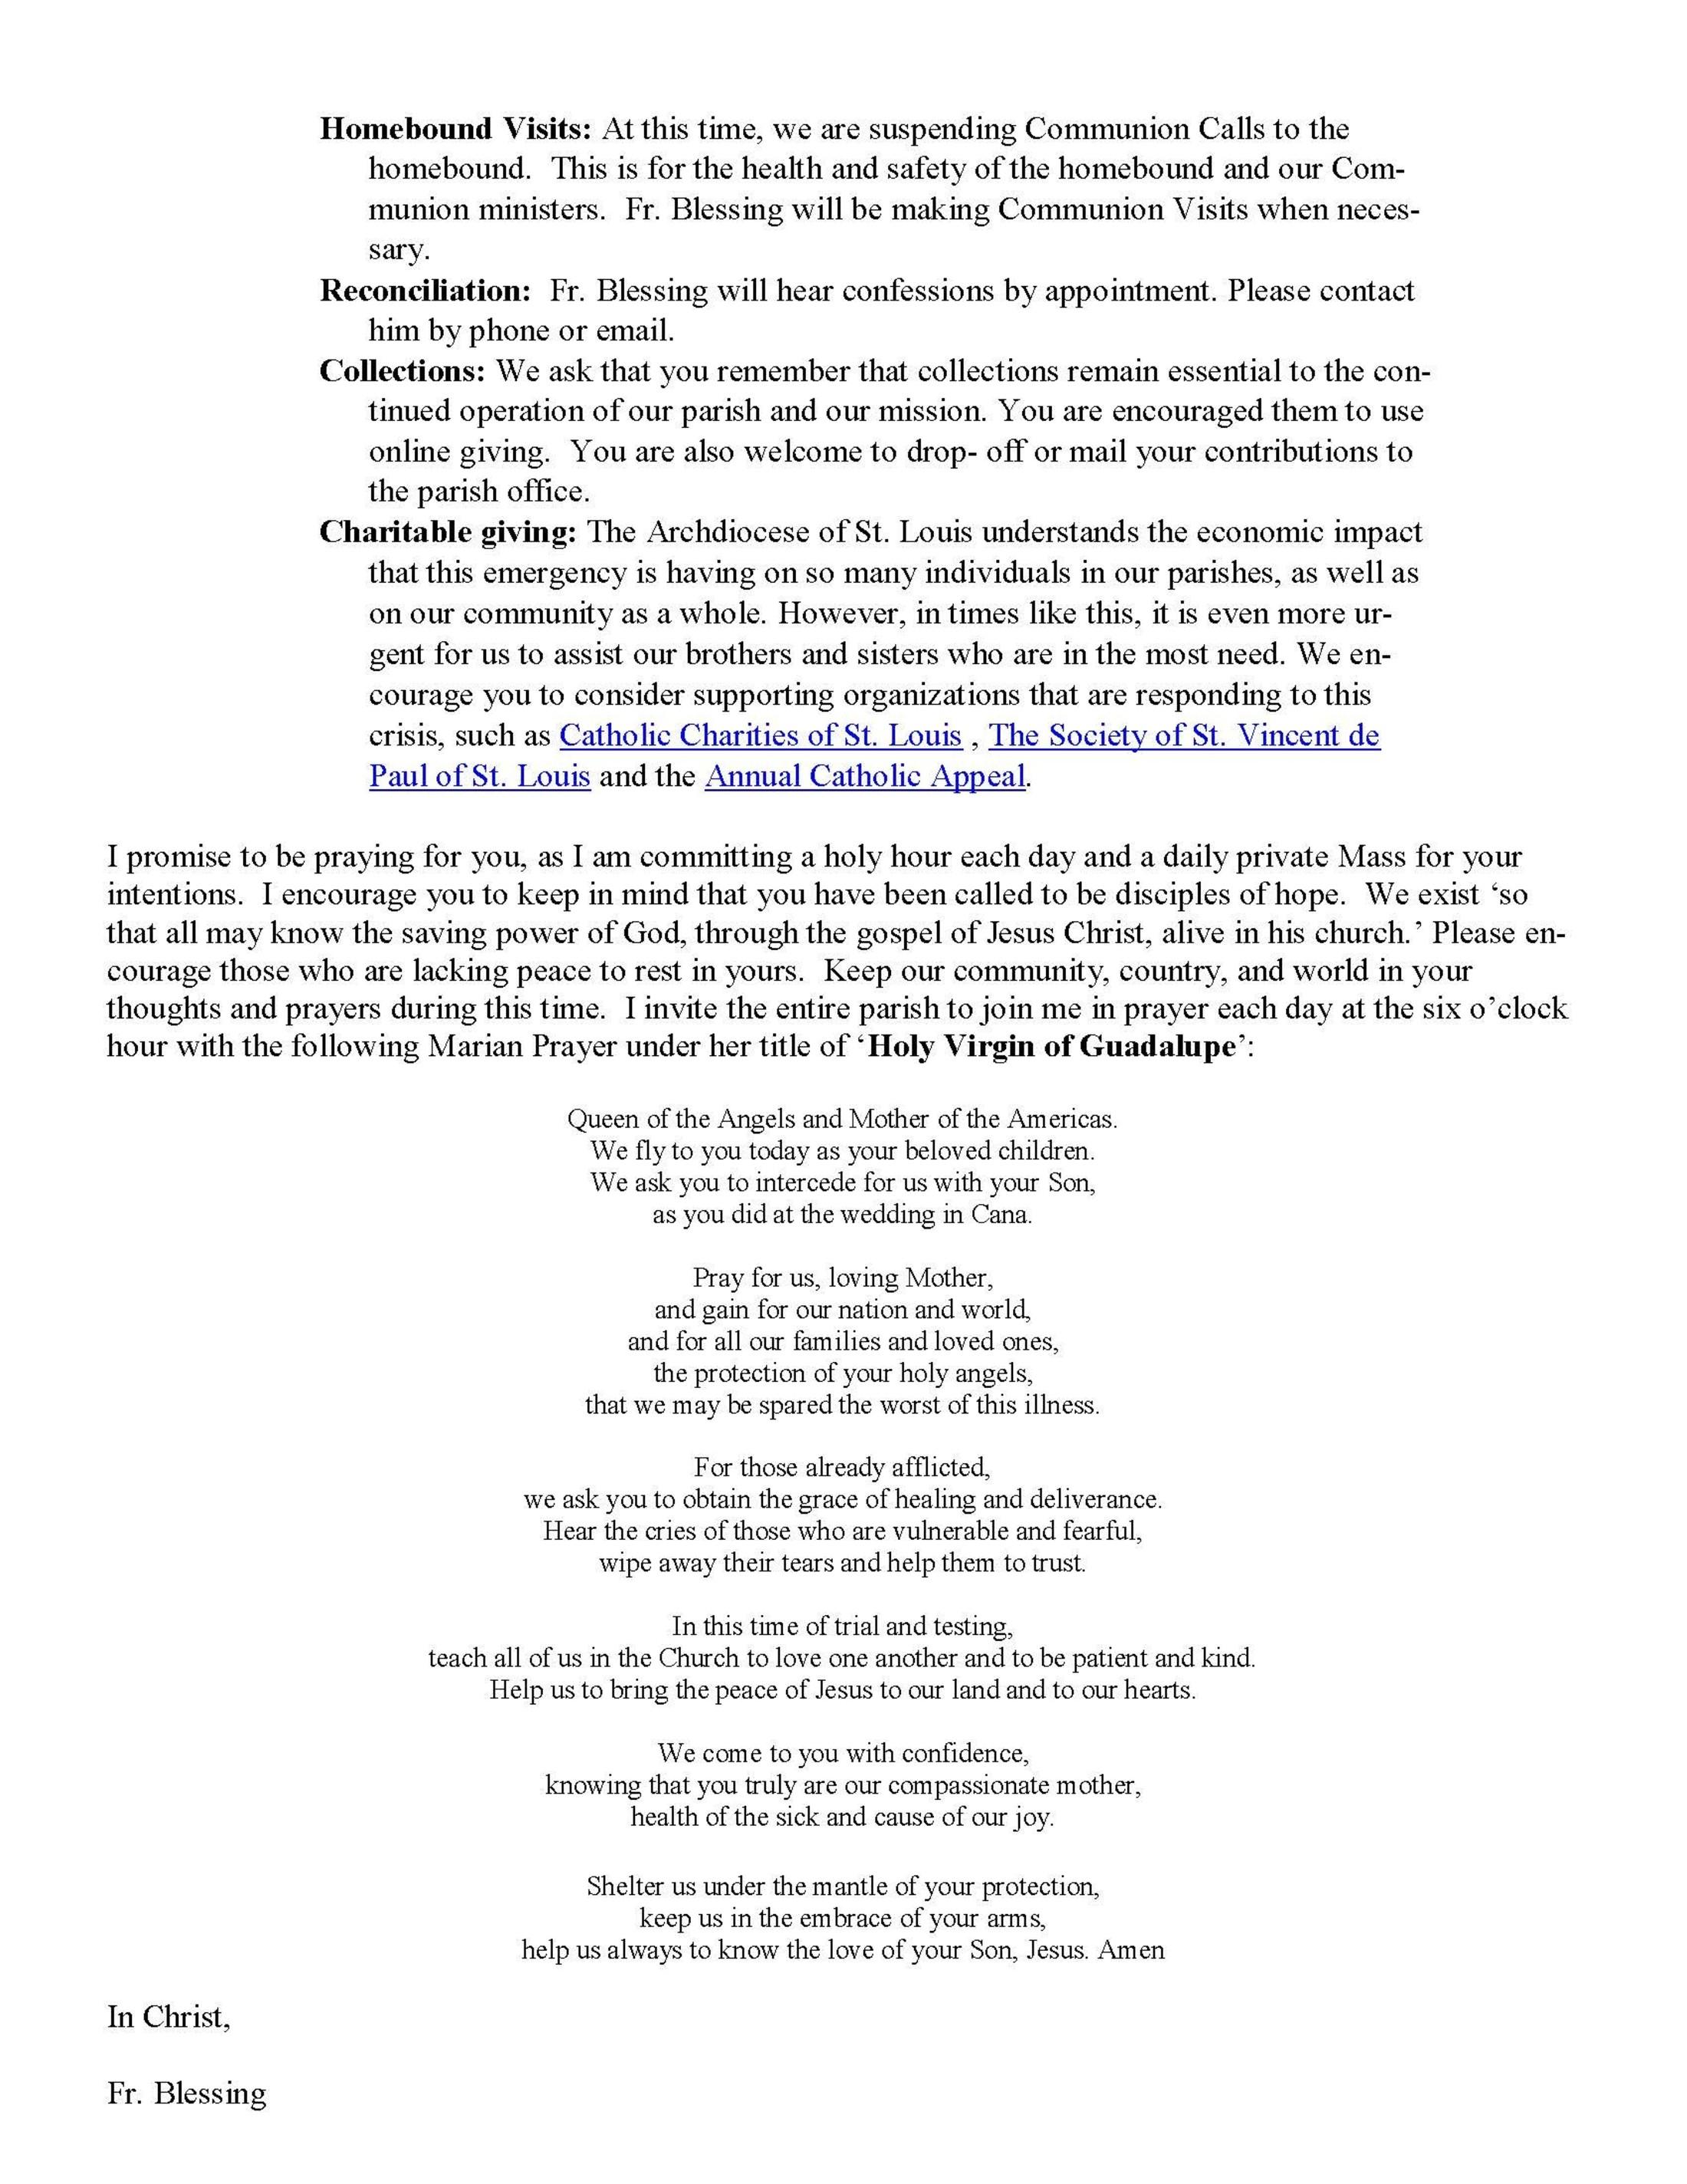 Coronavirus Letter To Parishioners Mar2020 Page 2